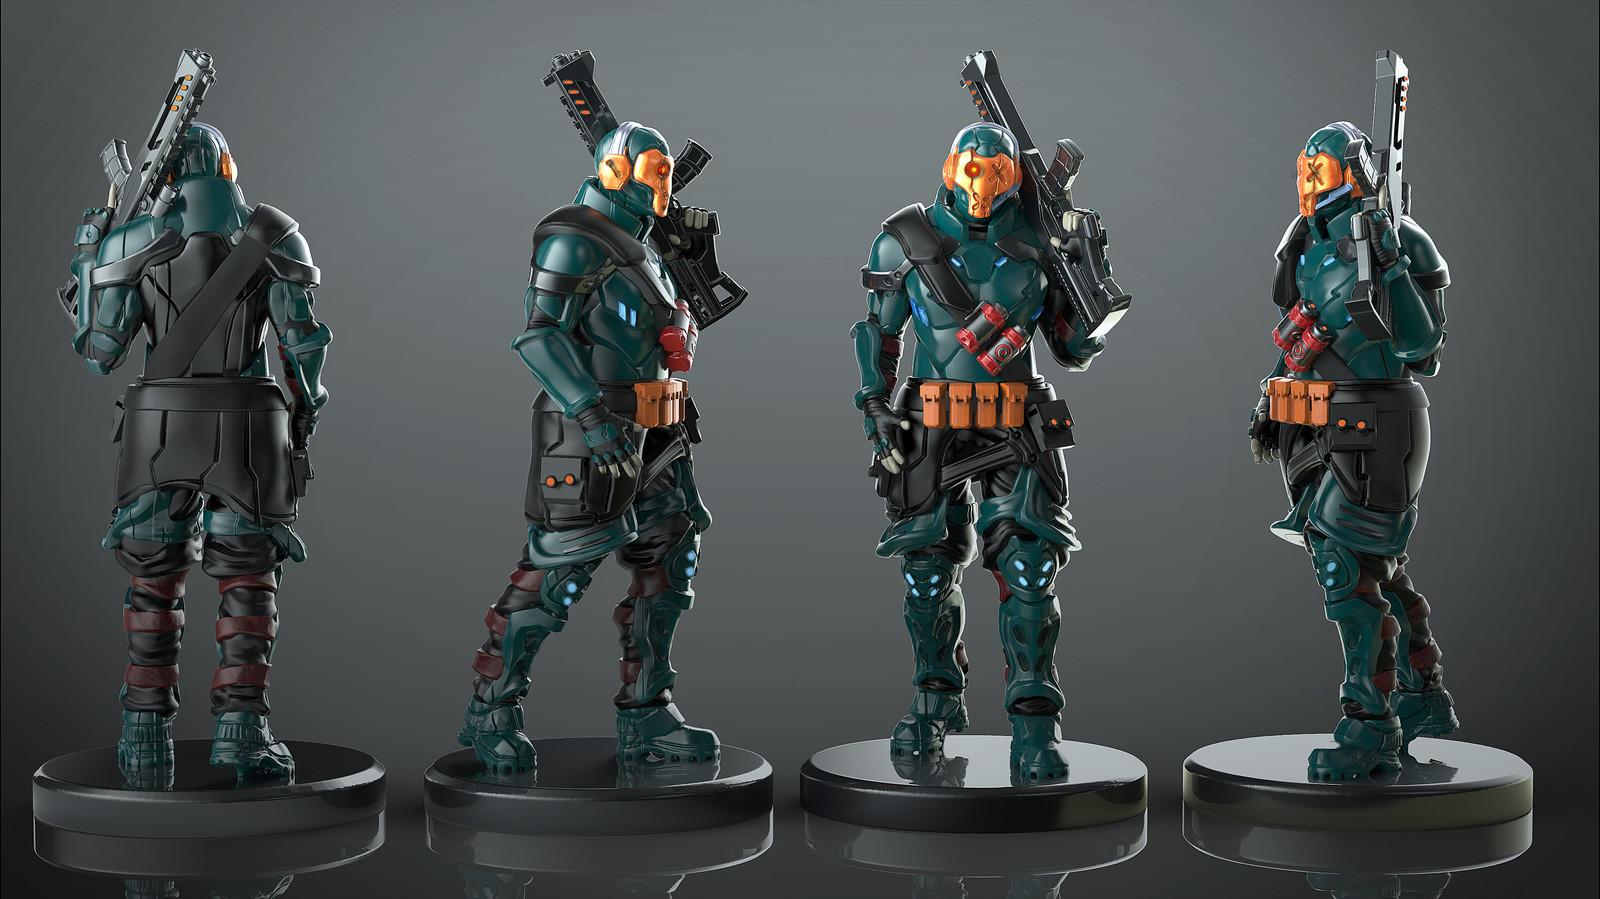 Upcoming wargame miniature